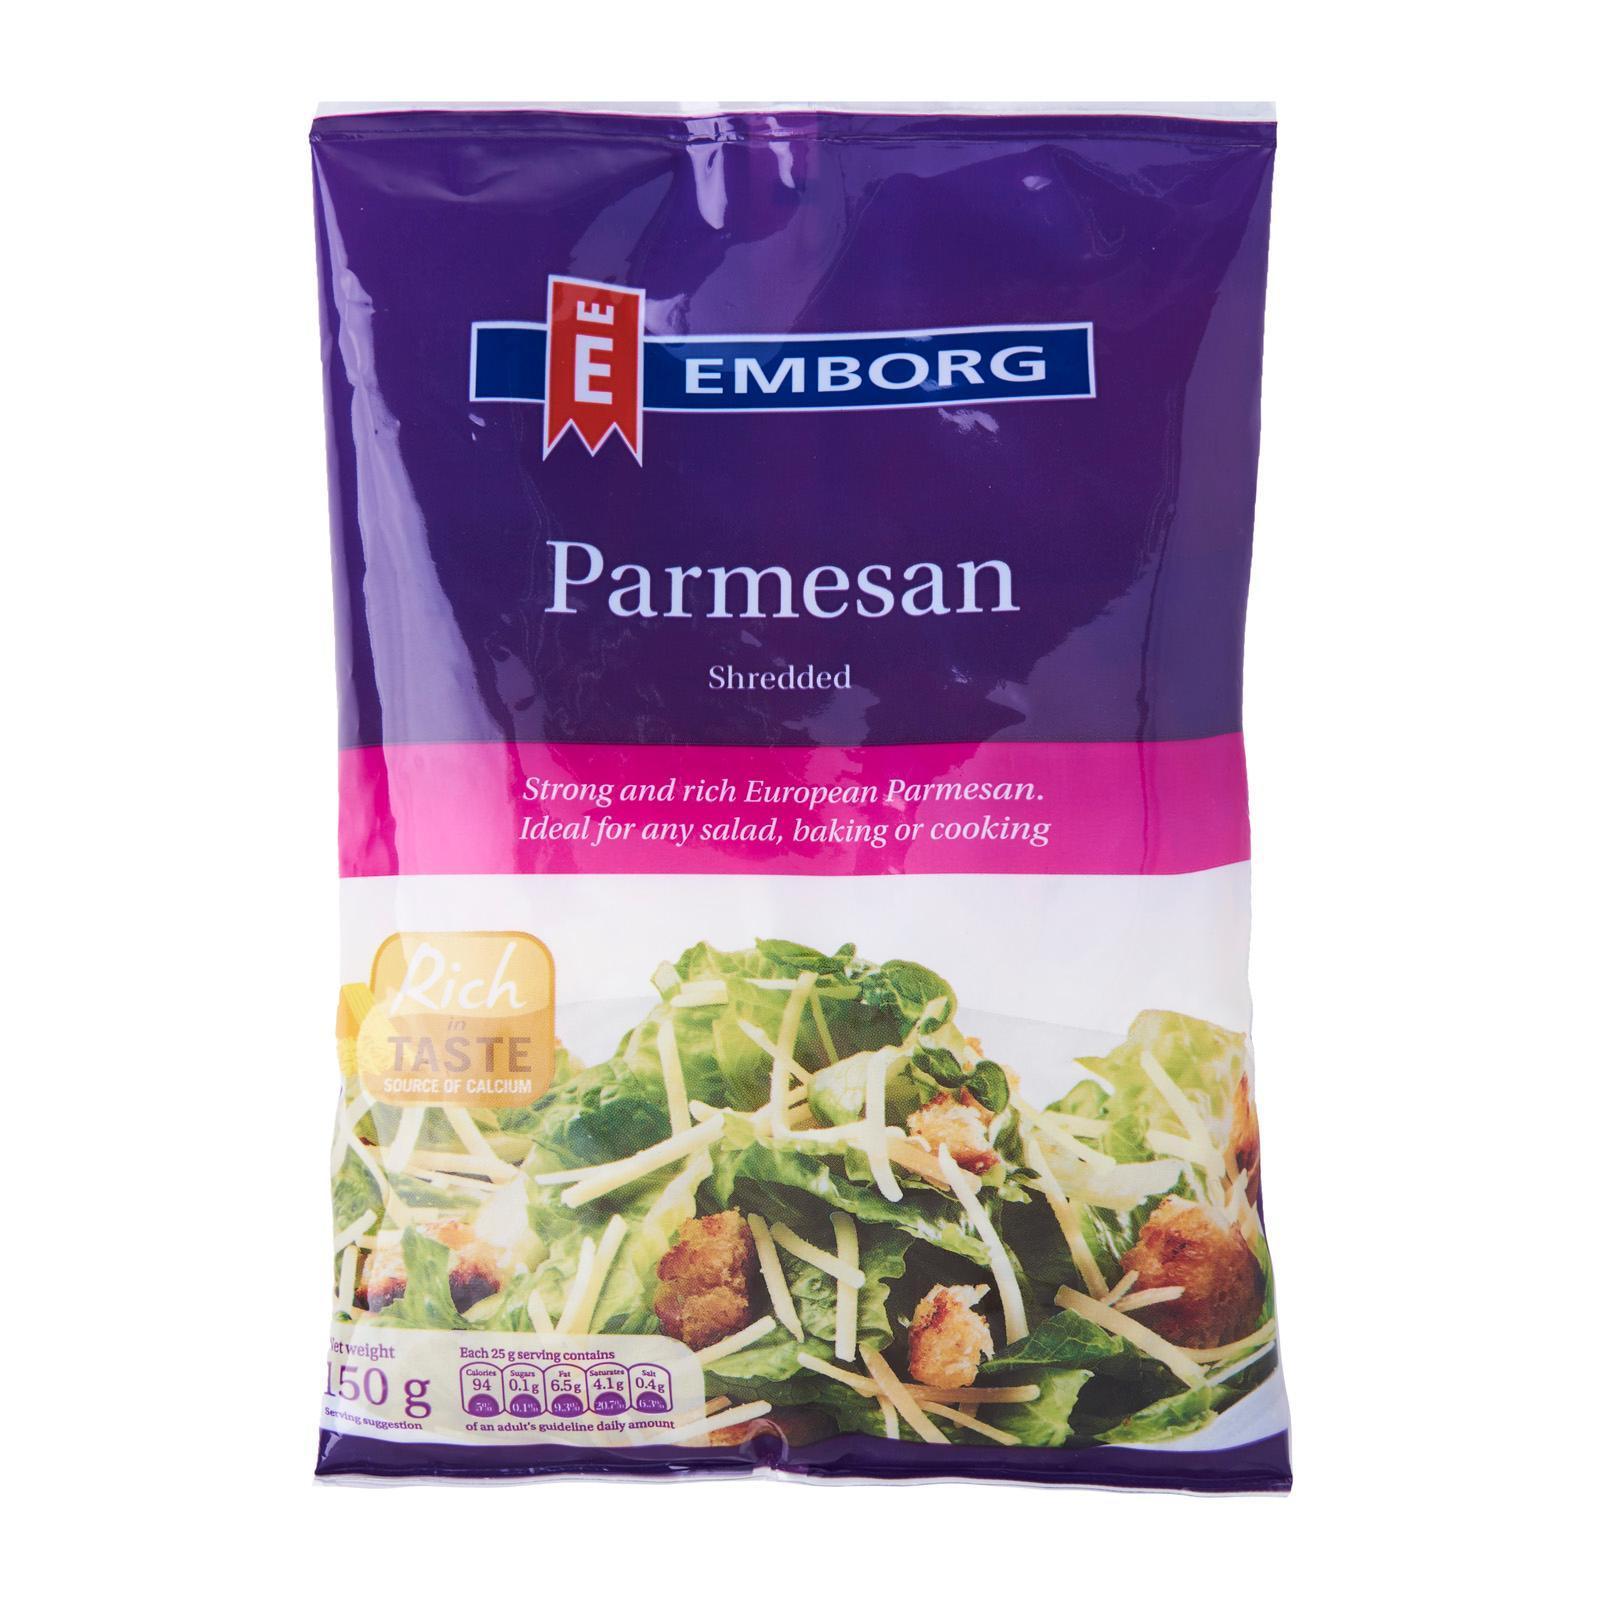 EMBORG Natural Parmesan Shredded 150g